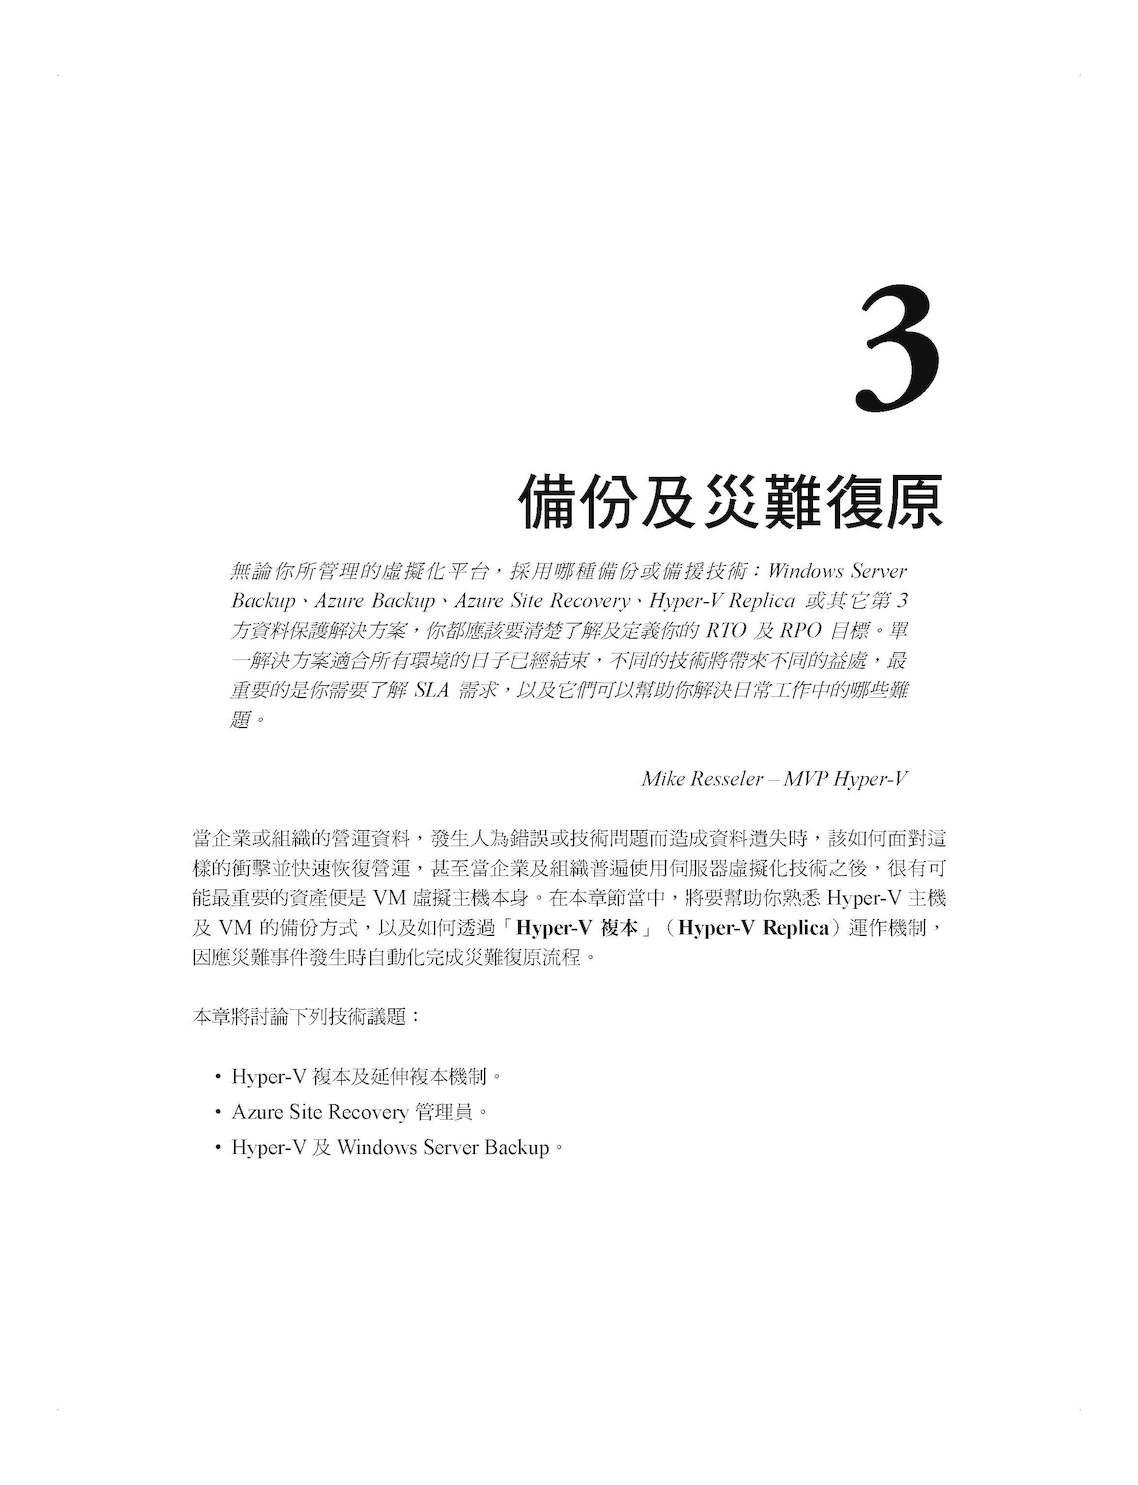 Hyper-V 最佳實踐:快速建置虛擬化解決方案 (Hyper-V Best Practices)-preview-3